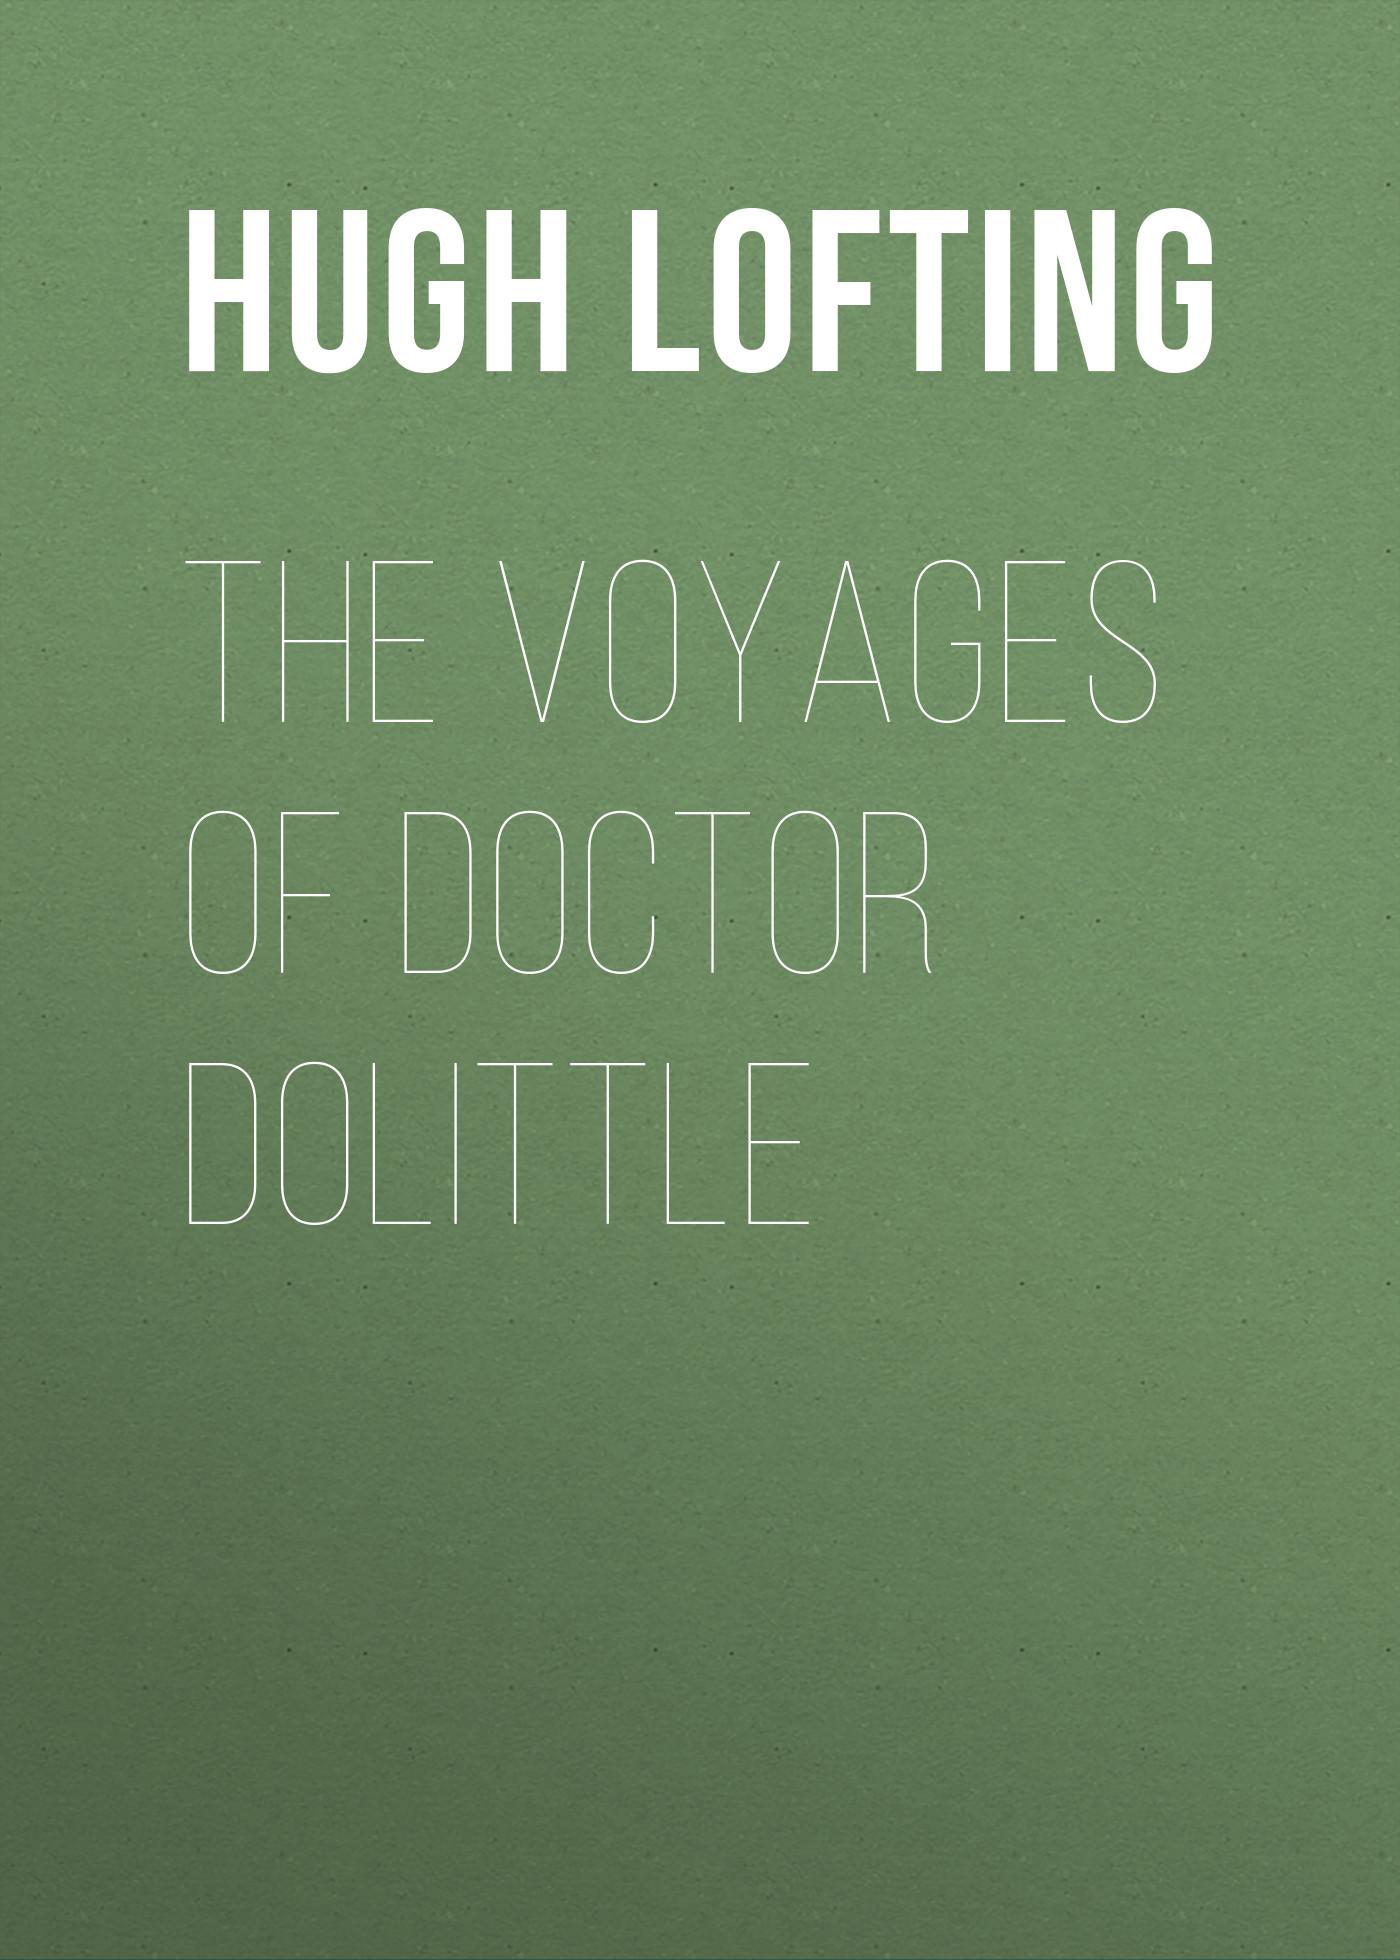 Hugh Lofting The Voyages of Doctor Dolittle недорого